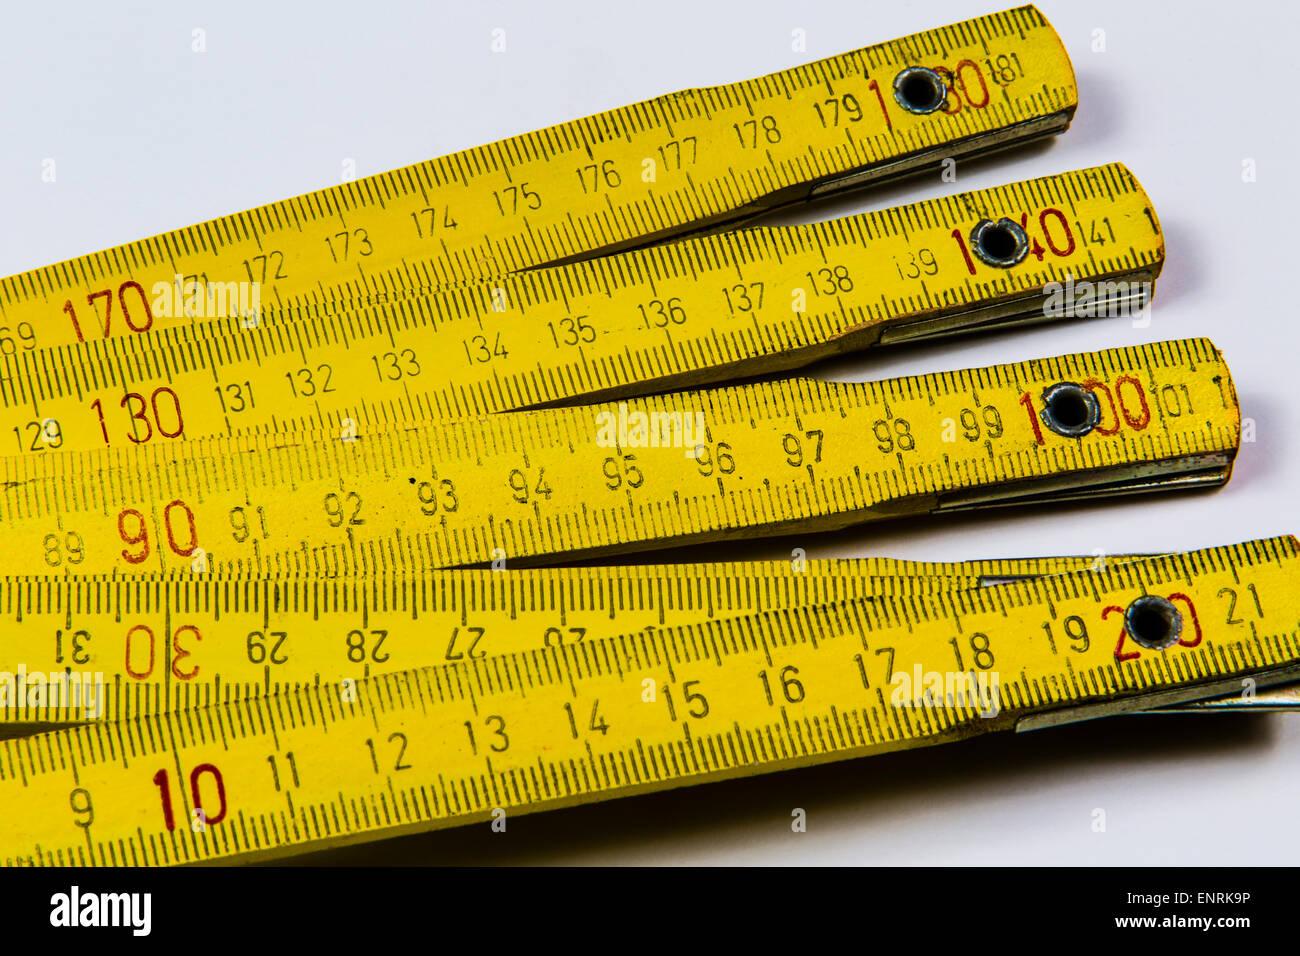 Yellow wooden folding ruler on white background - Stock Image